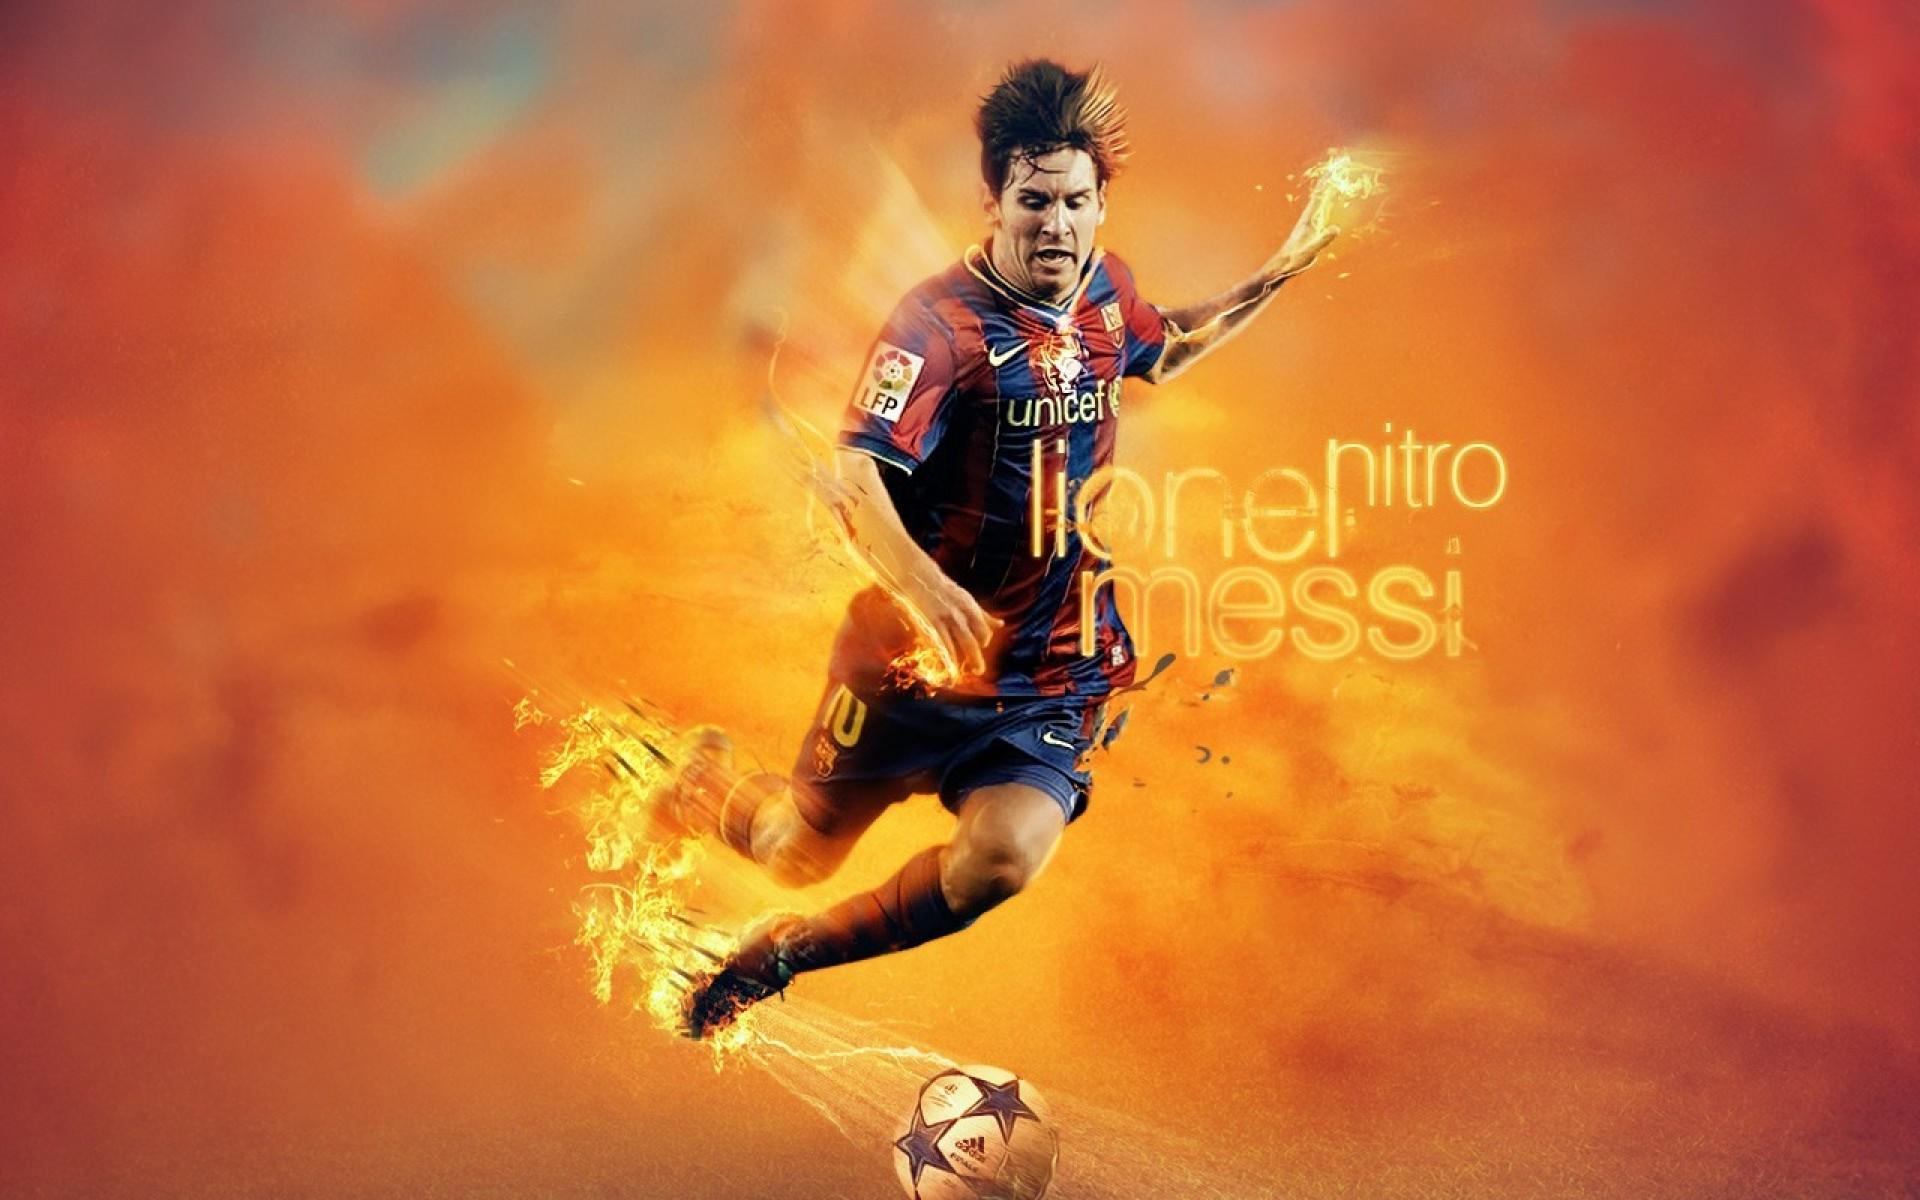 Wallpaper Barcelona Fc 3d Messi Football Wallpapers Hd Pixelstalk Net